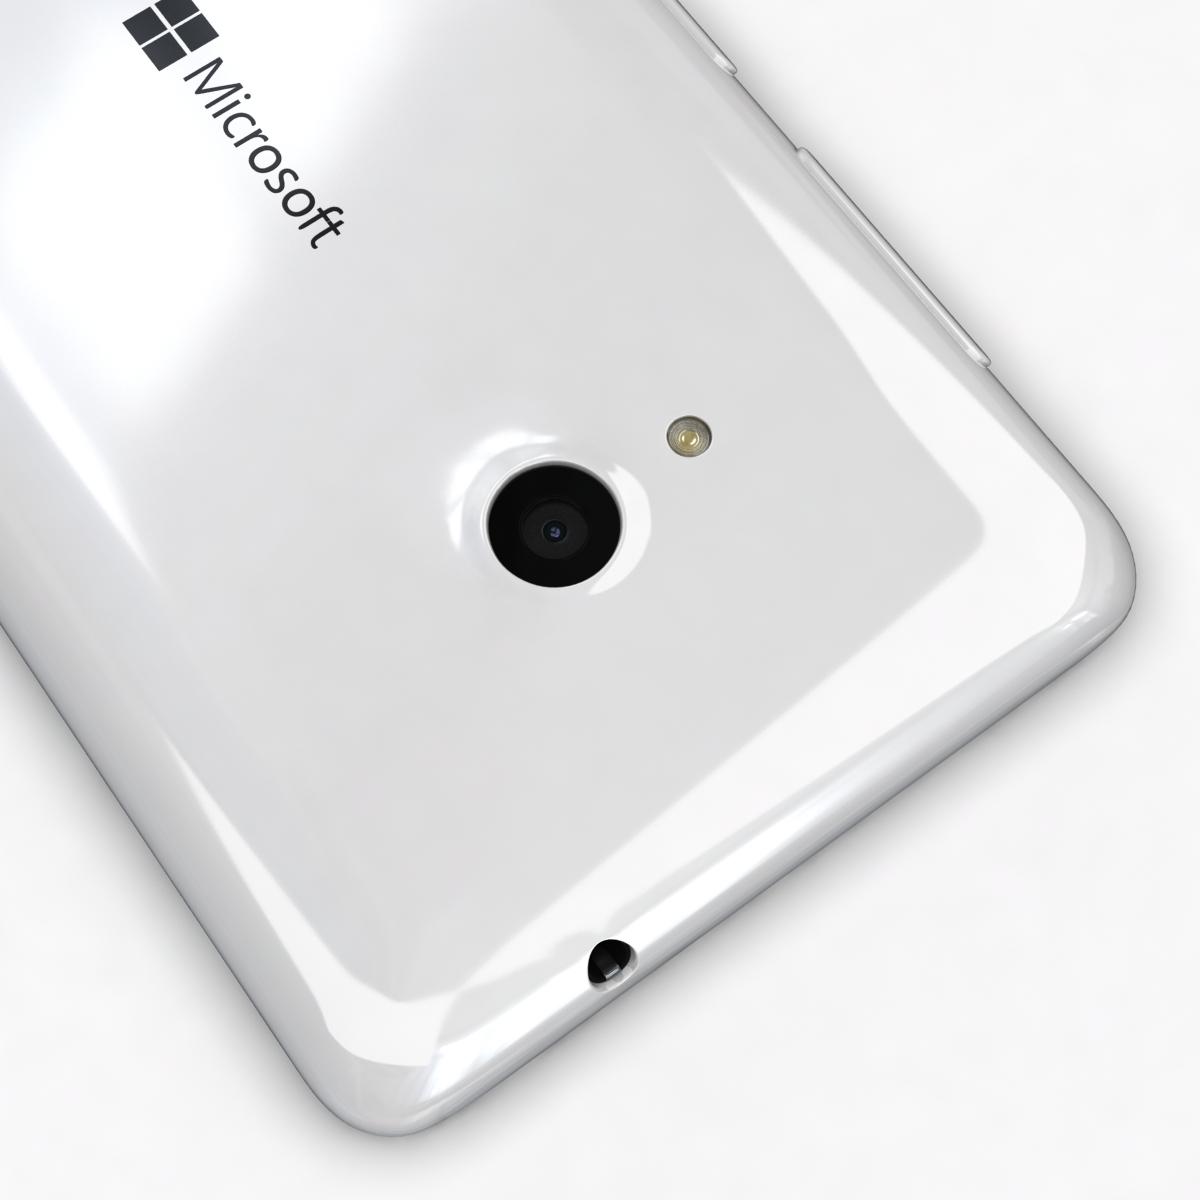 microsoft lumia 535 and dual sim white 3d model 3ds max fbx c4d obj 204289